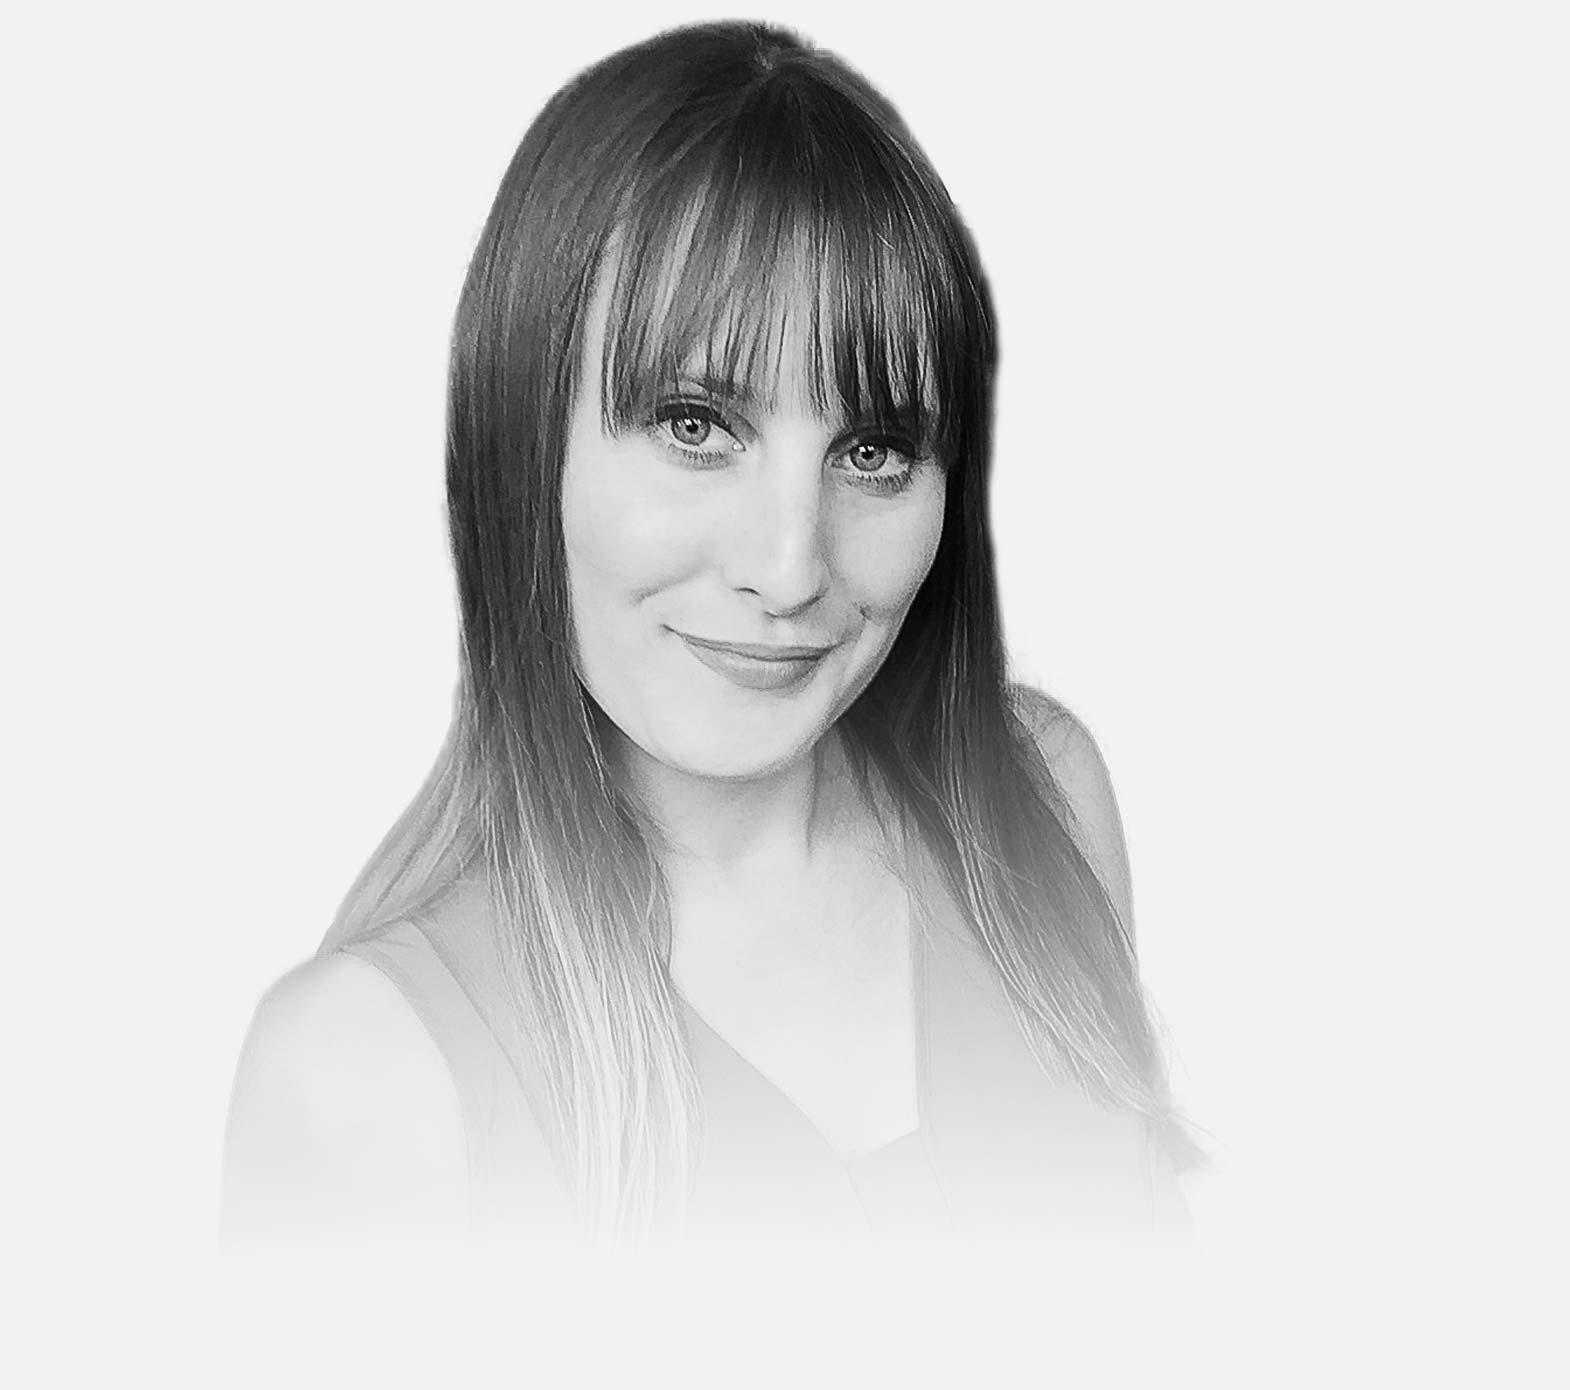 Portrait of Christina Connolly